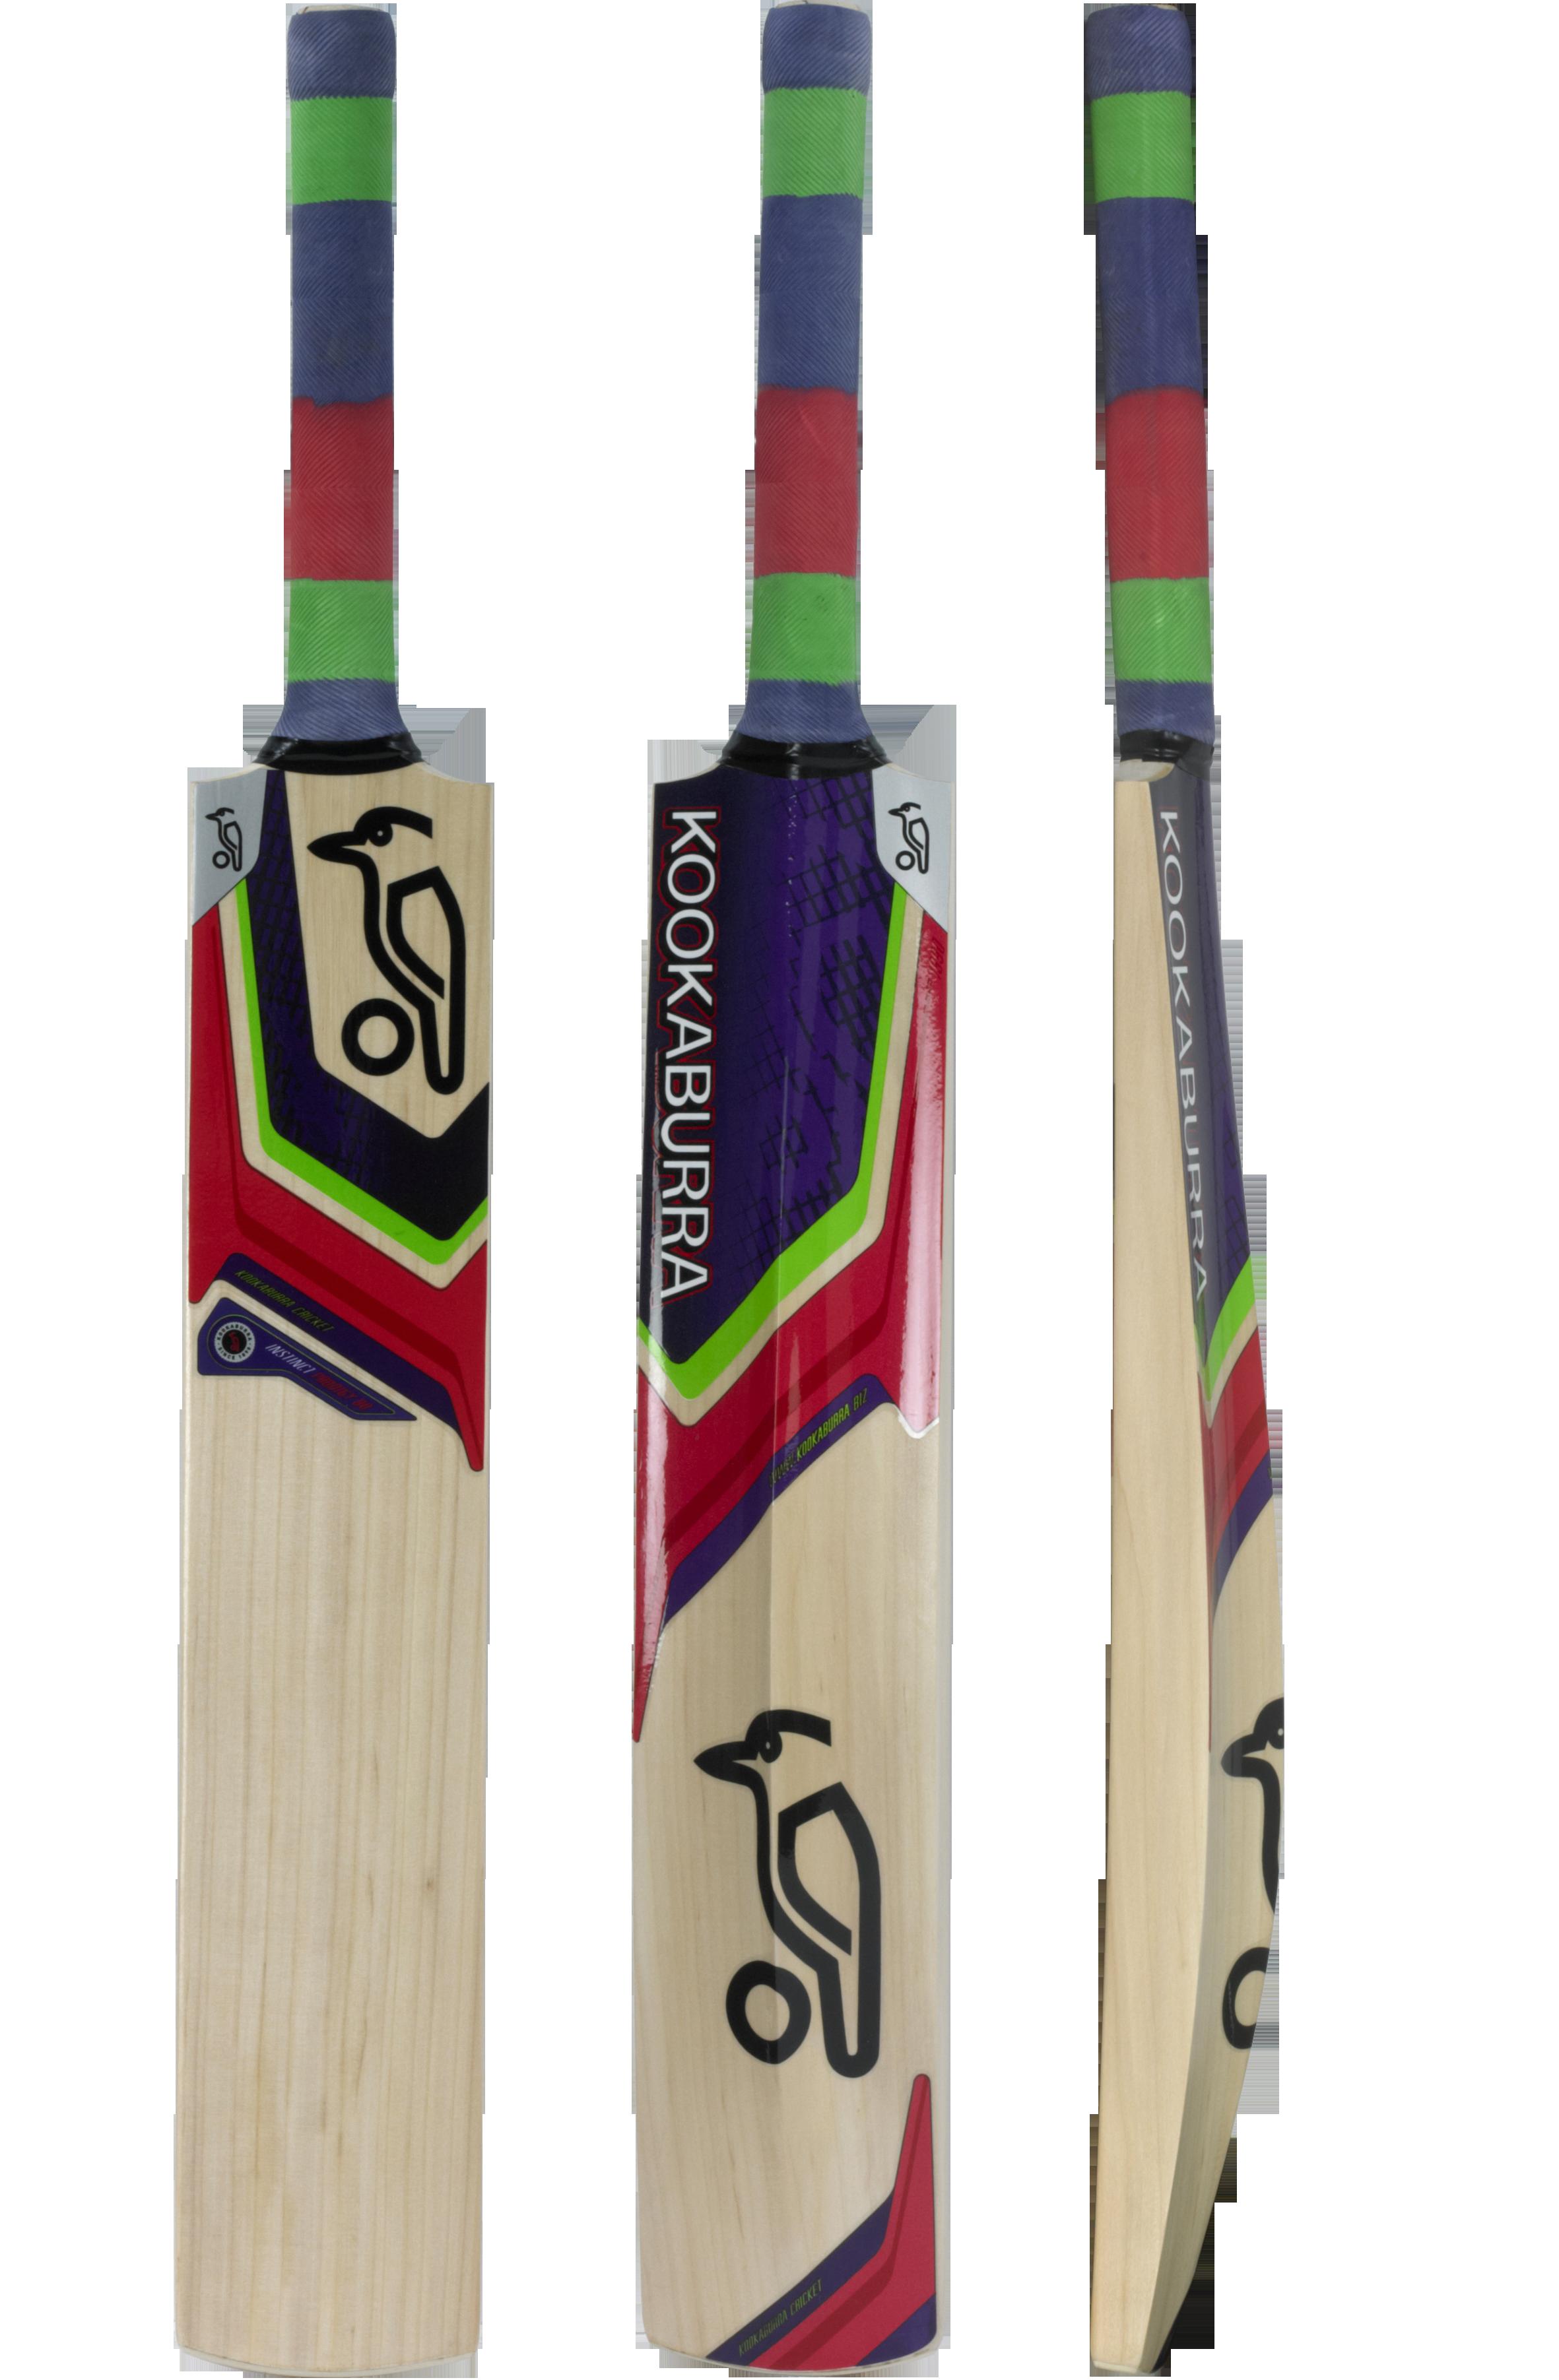 Instinct Prodigy 80 - Cricket Bat PNG HD